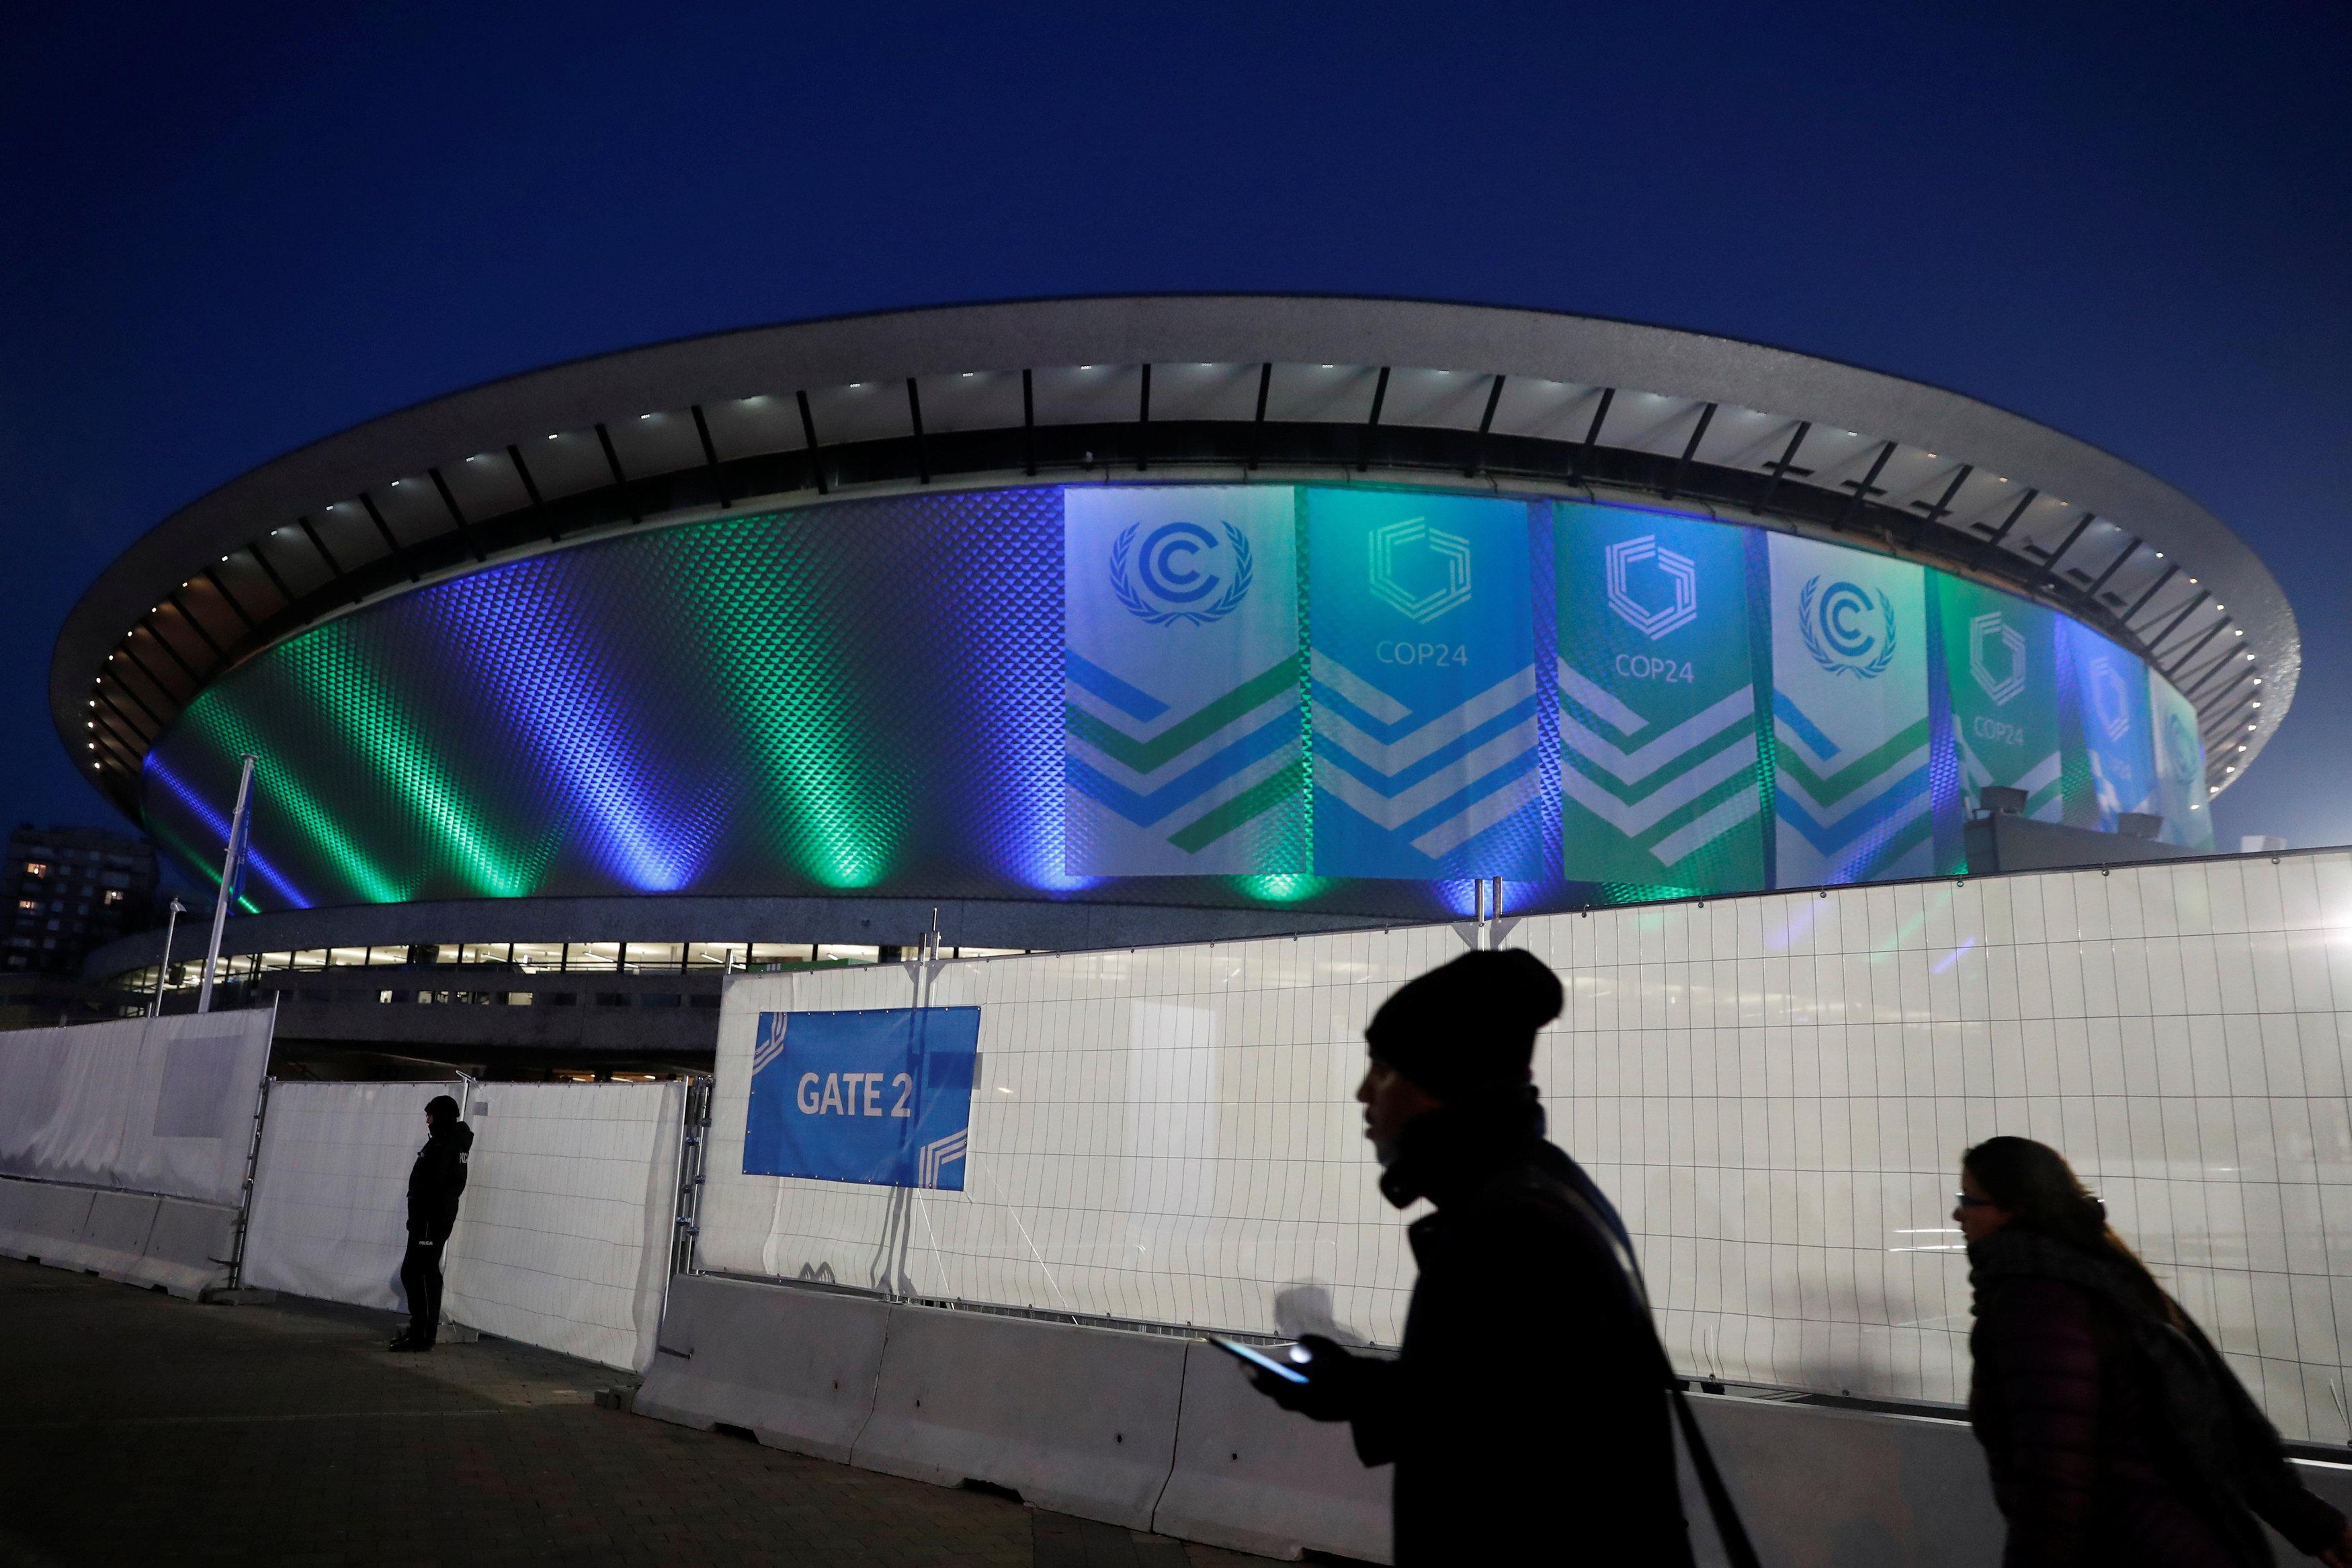 U S , Russia, Saudis, Kuwait balk at endorsing key climate